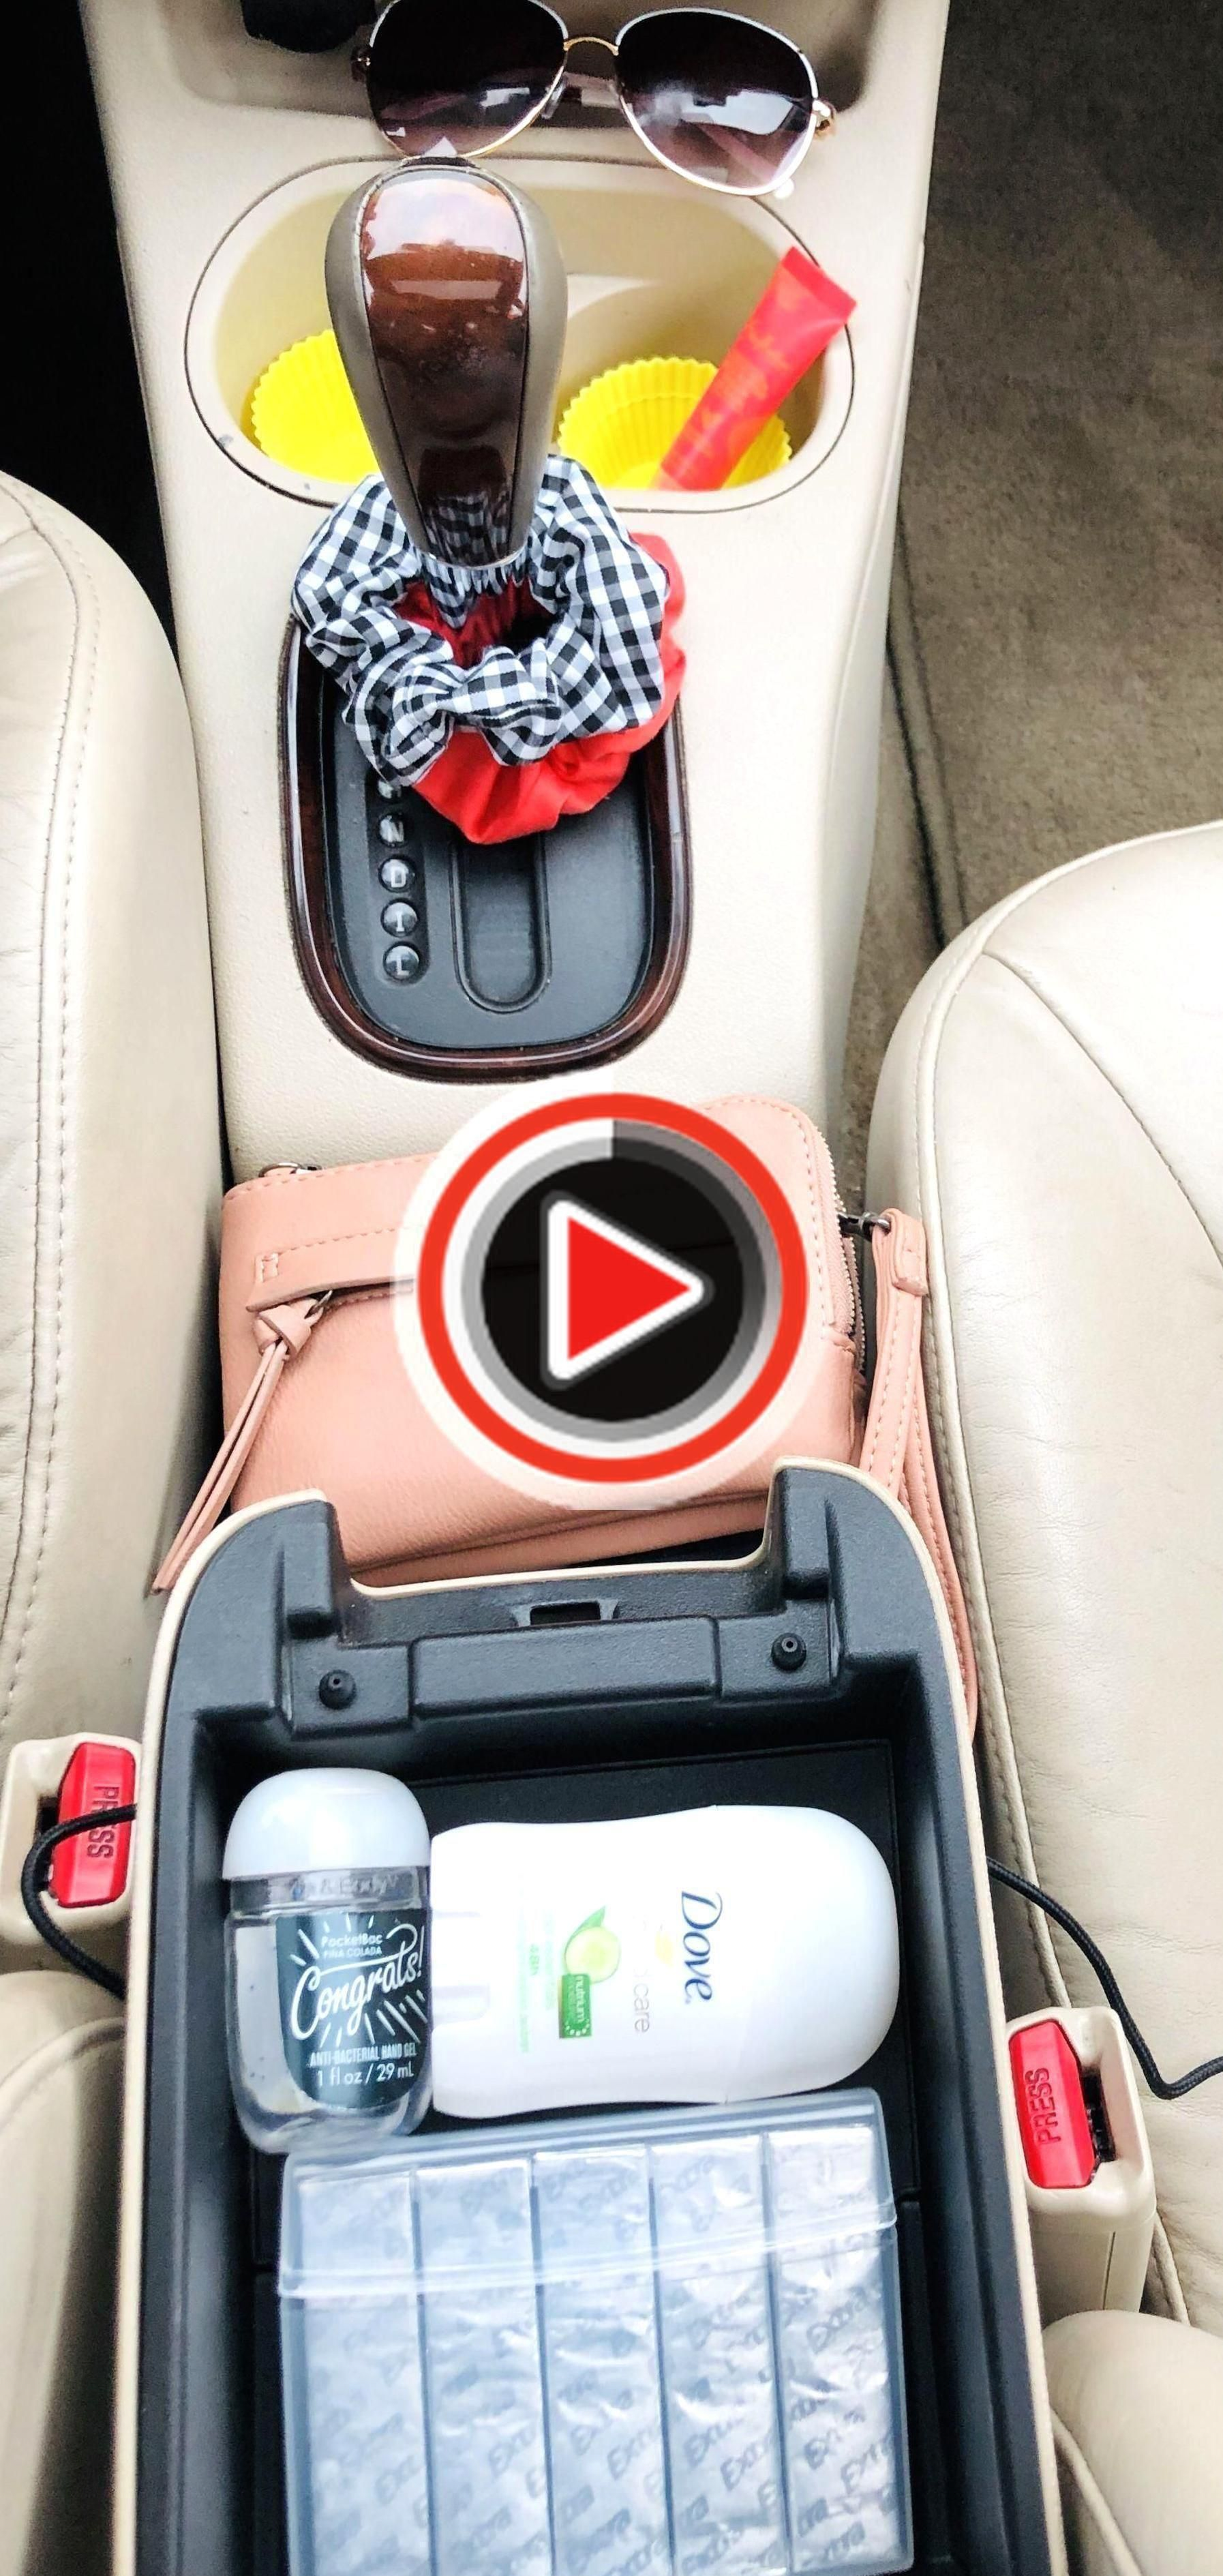 Pin On Auto Essentials In 2020 Preppy Car Car Essentials Cute Car Accessories